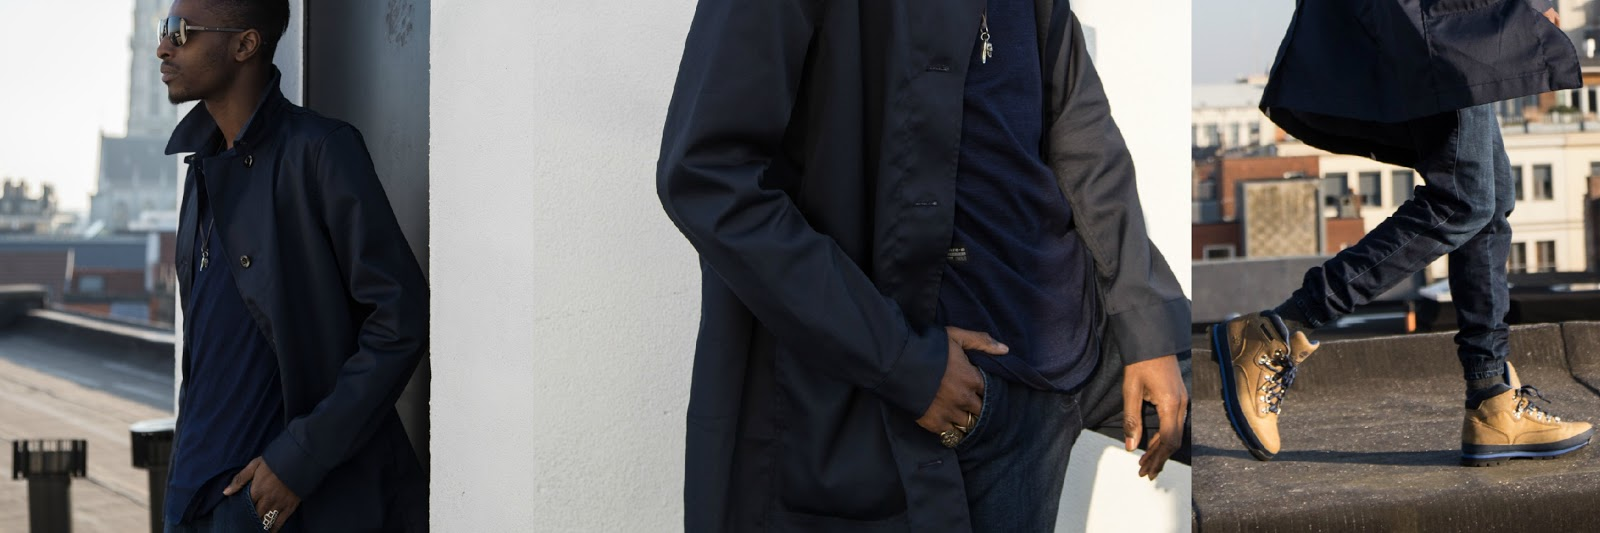 JONTHEGOLD rooftop blue g-star raw coat wefashion jogger  timberland boots salvatore ferragamo sunglasses bohemian vixen accessories